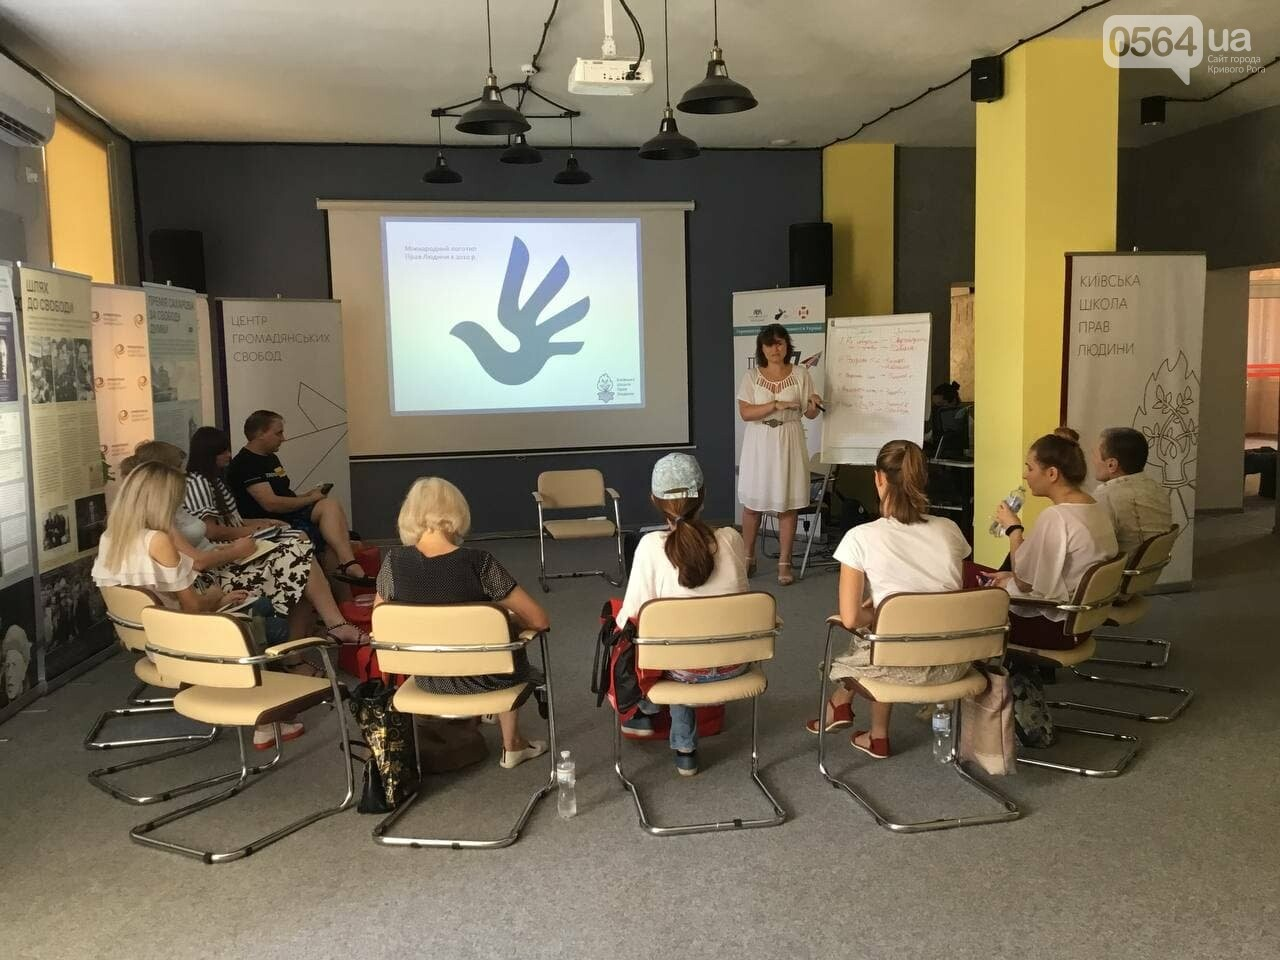 Криворожанам прочитали лекции о гендерном (не) равенстве и правах человека, - ФОТО, ВИДЕО, фото-1